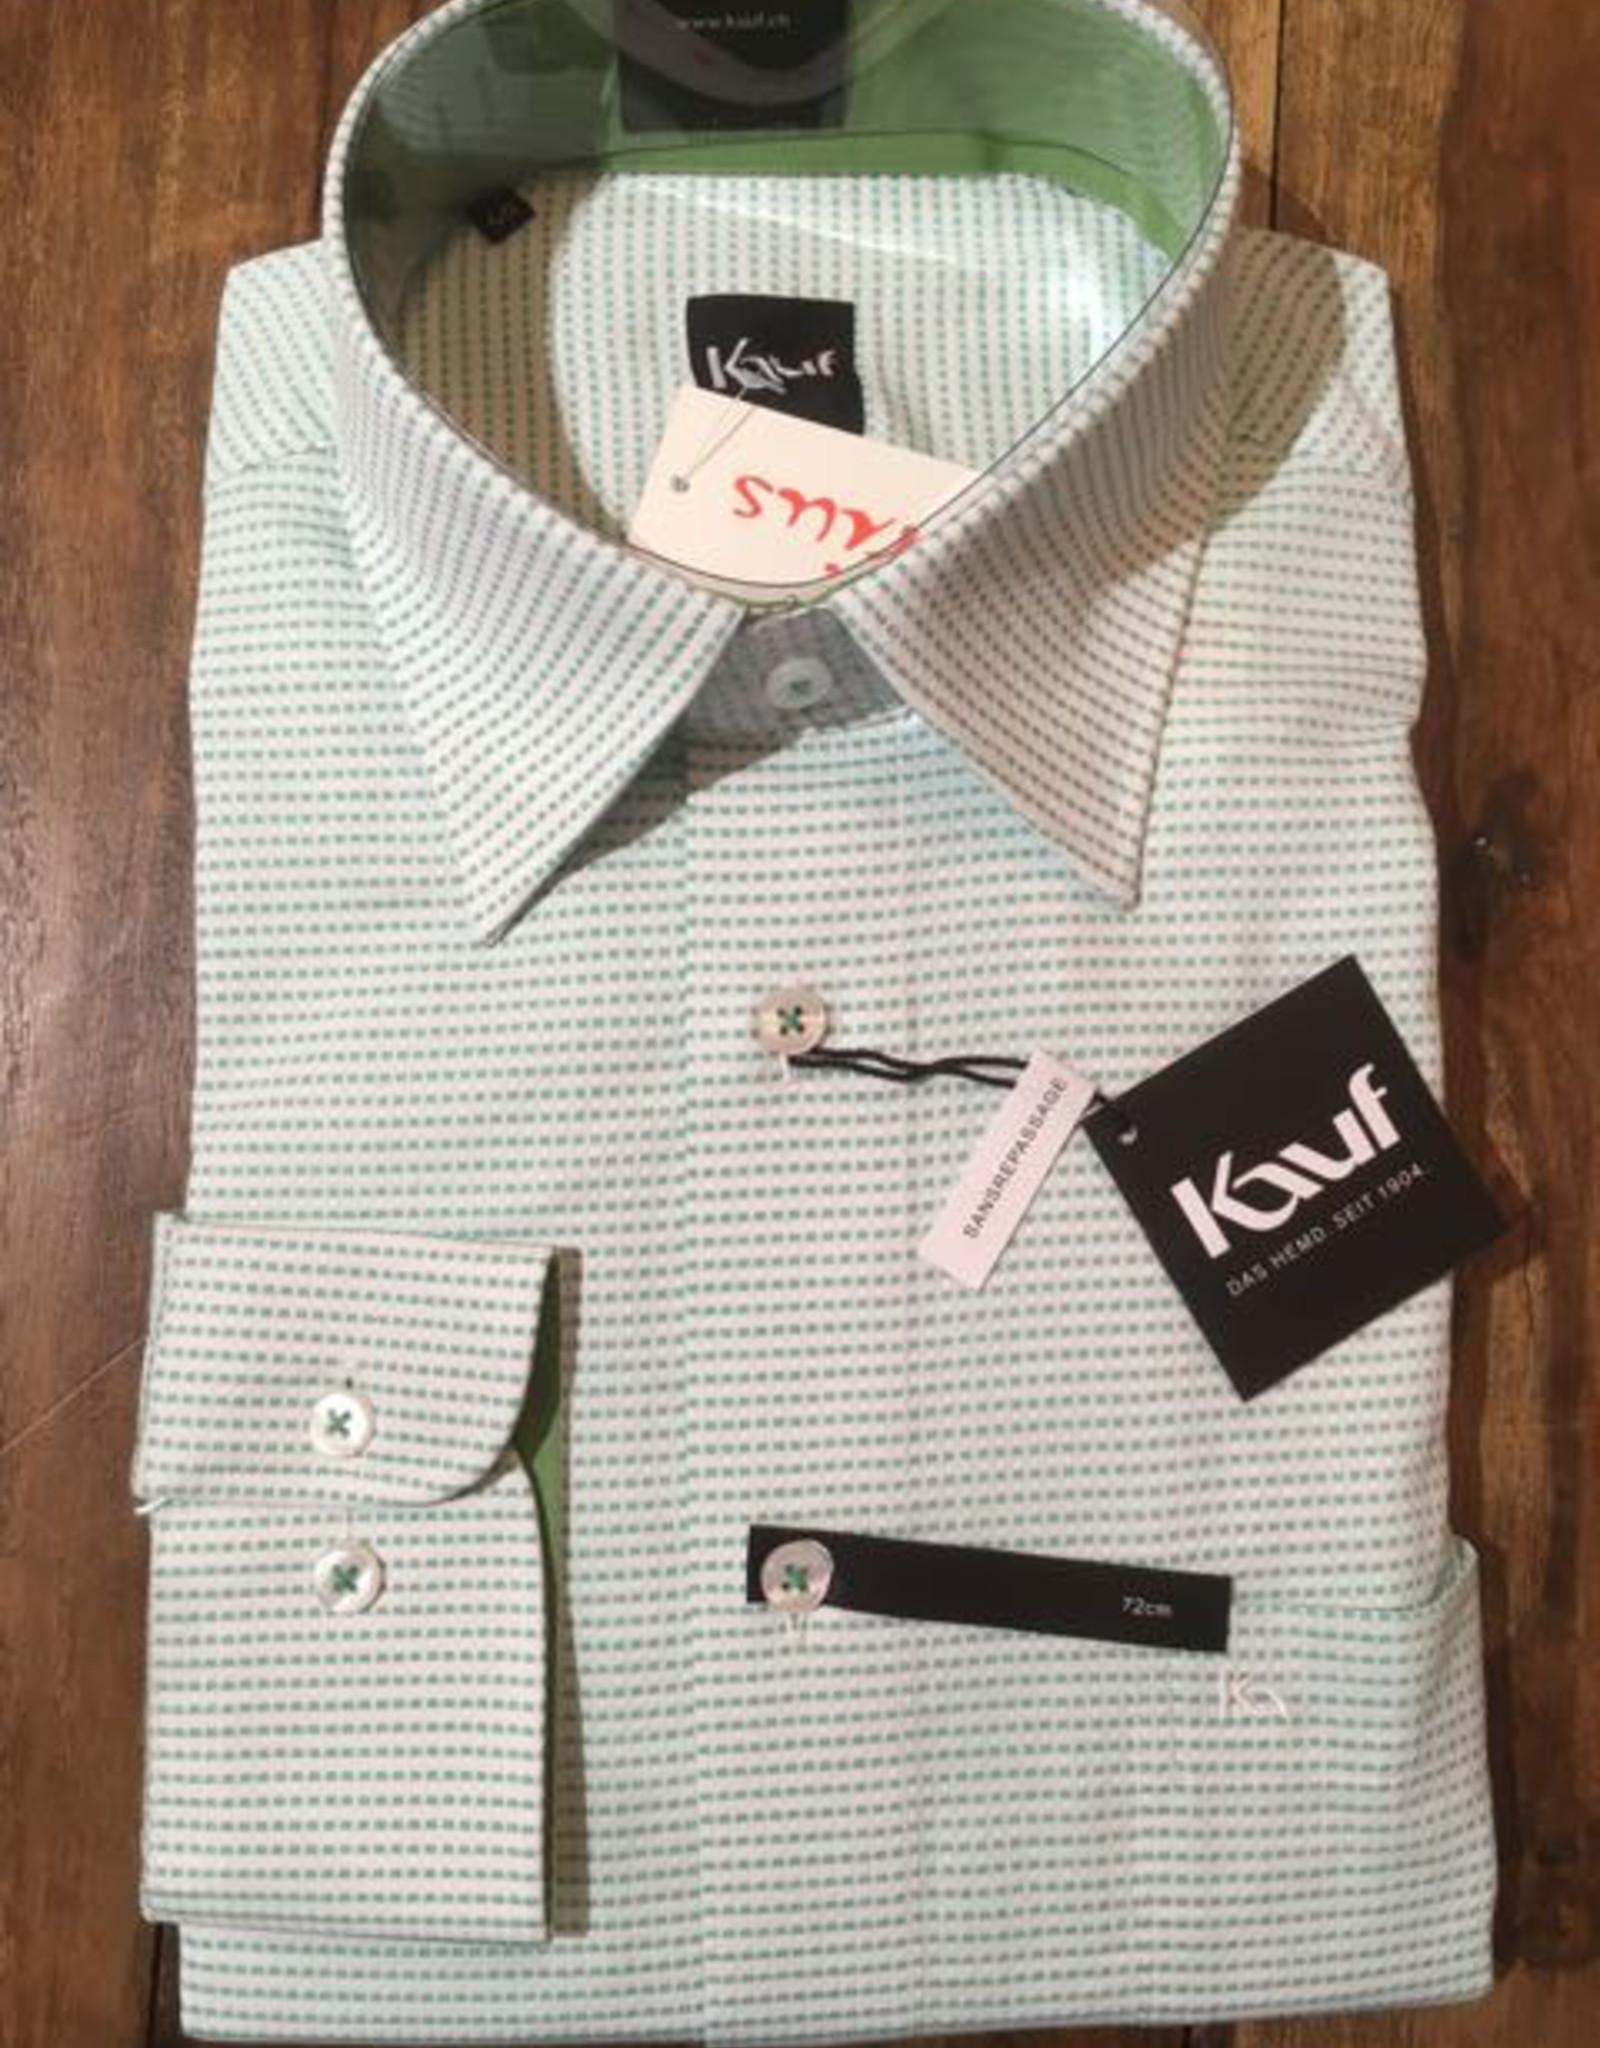 Kauf Kauf Slimfit H-Hemd, tailliert, Streifenoptik